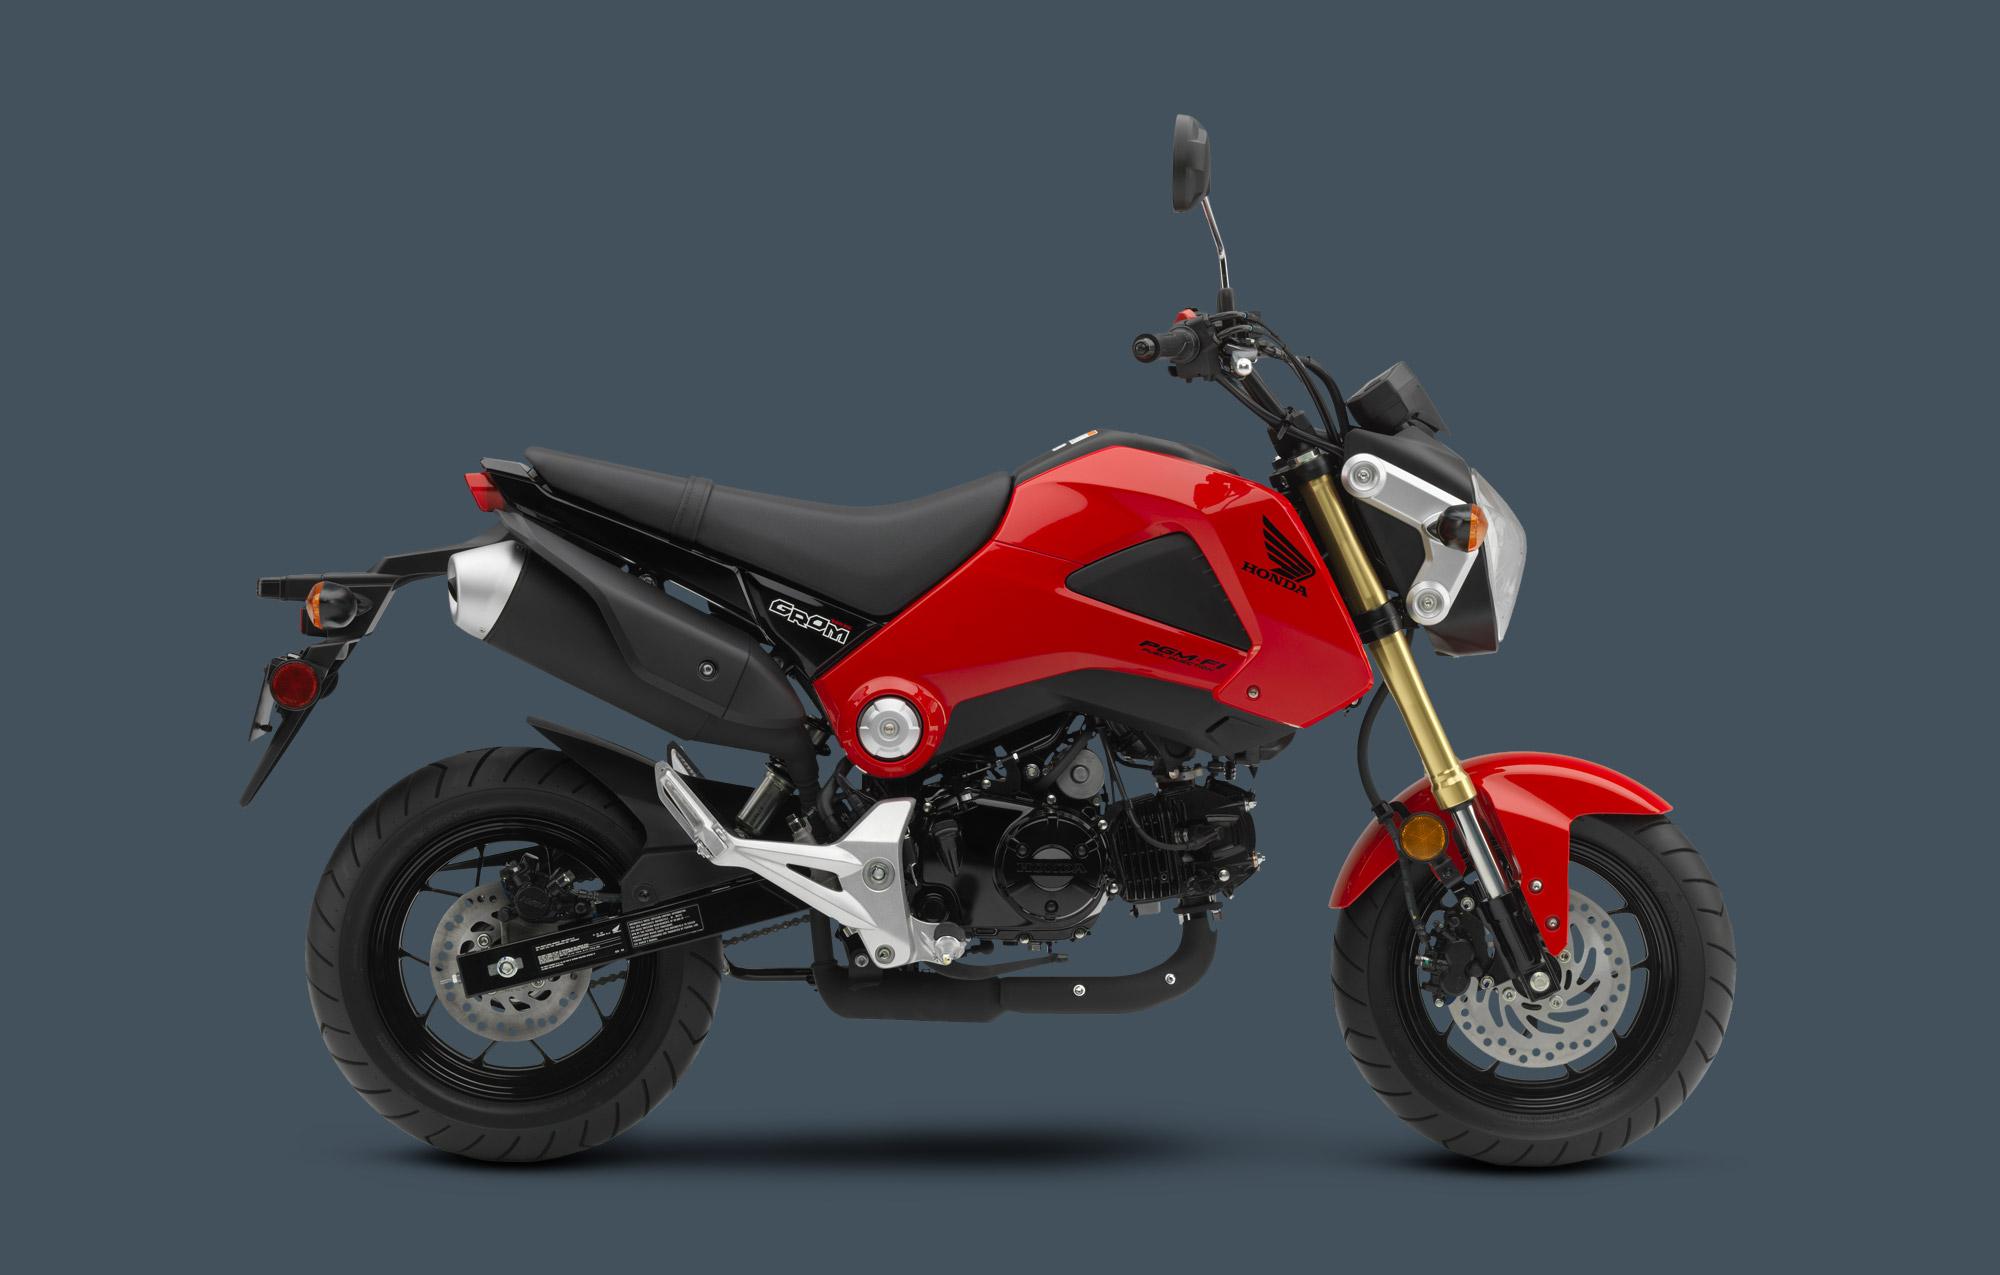 2014 Honda Grom Price Announced In Canada Autoevolution